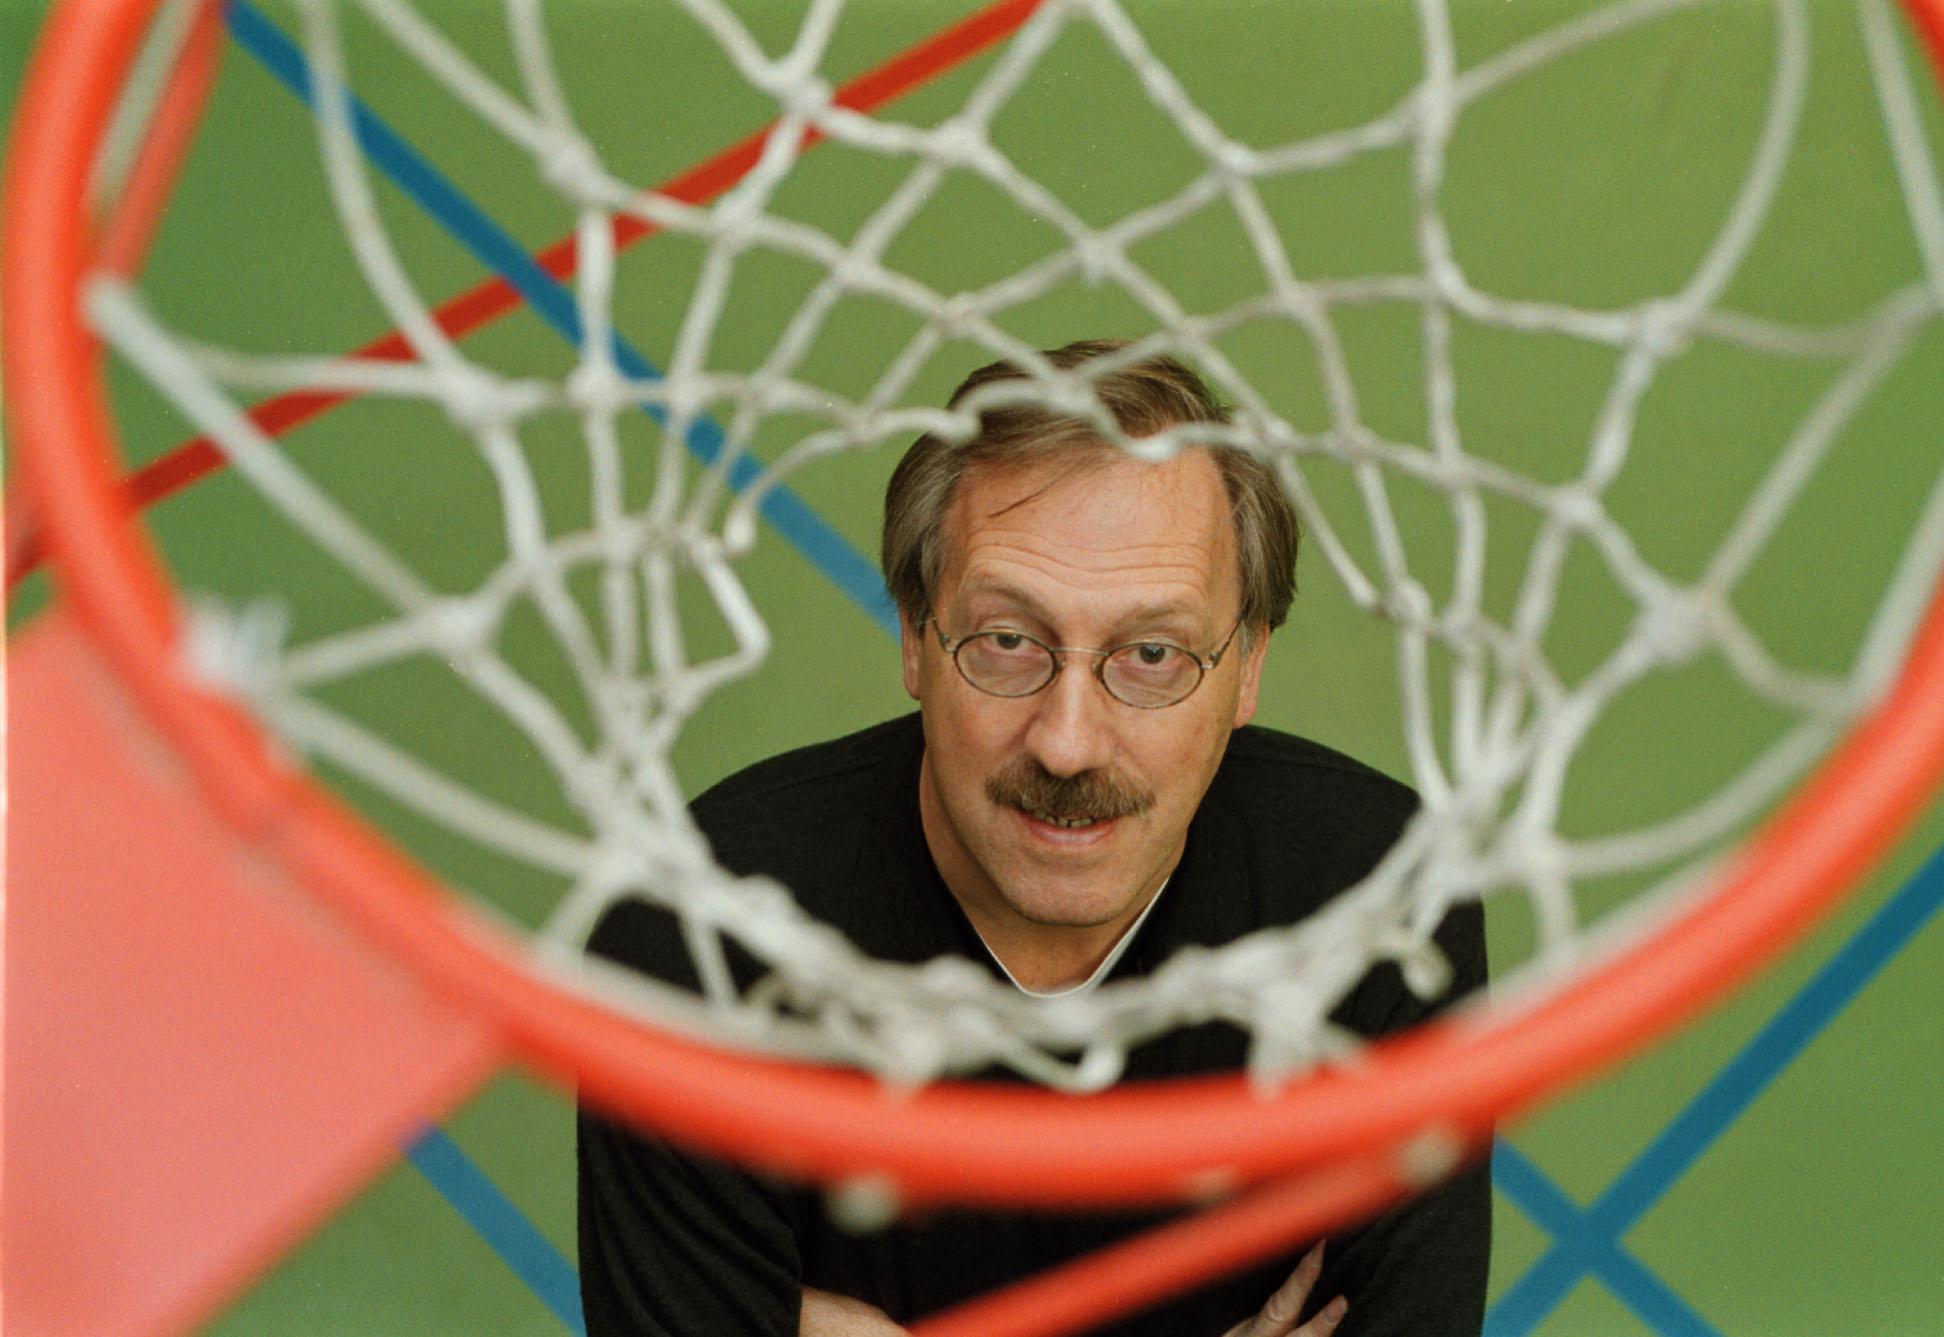 Erik Jager (1942-2020): gedreven als basketballer, gedreven als huisarts